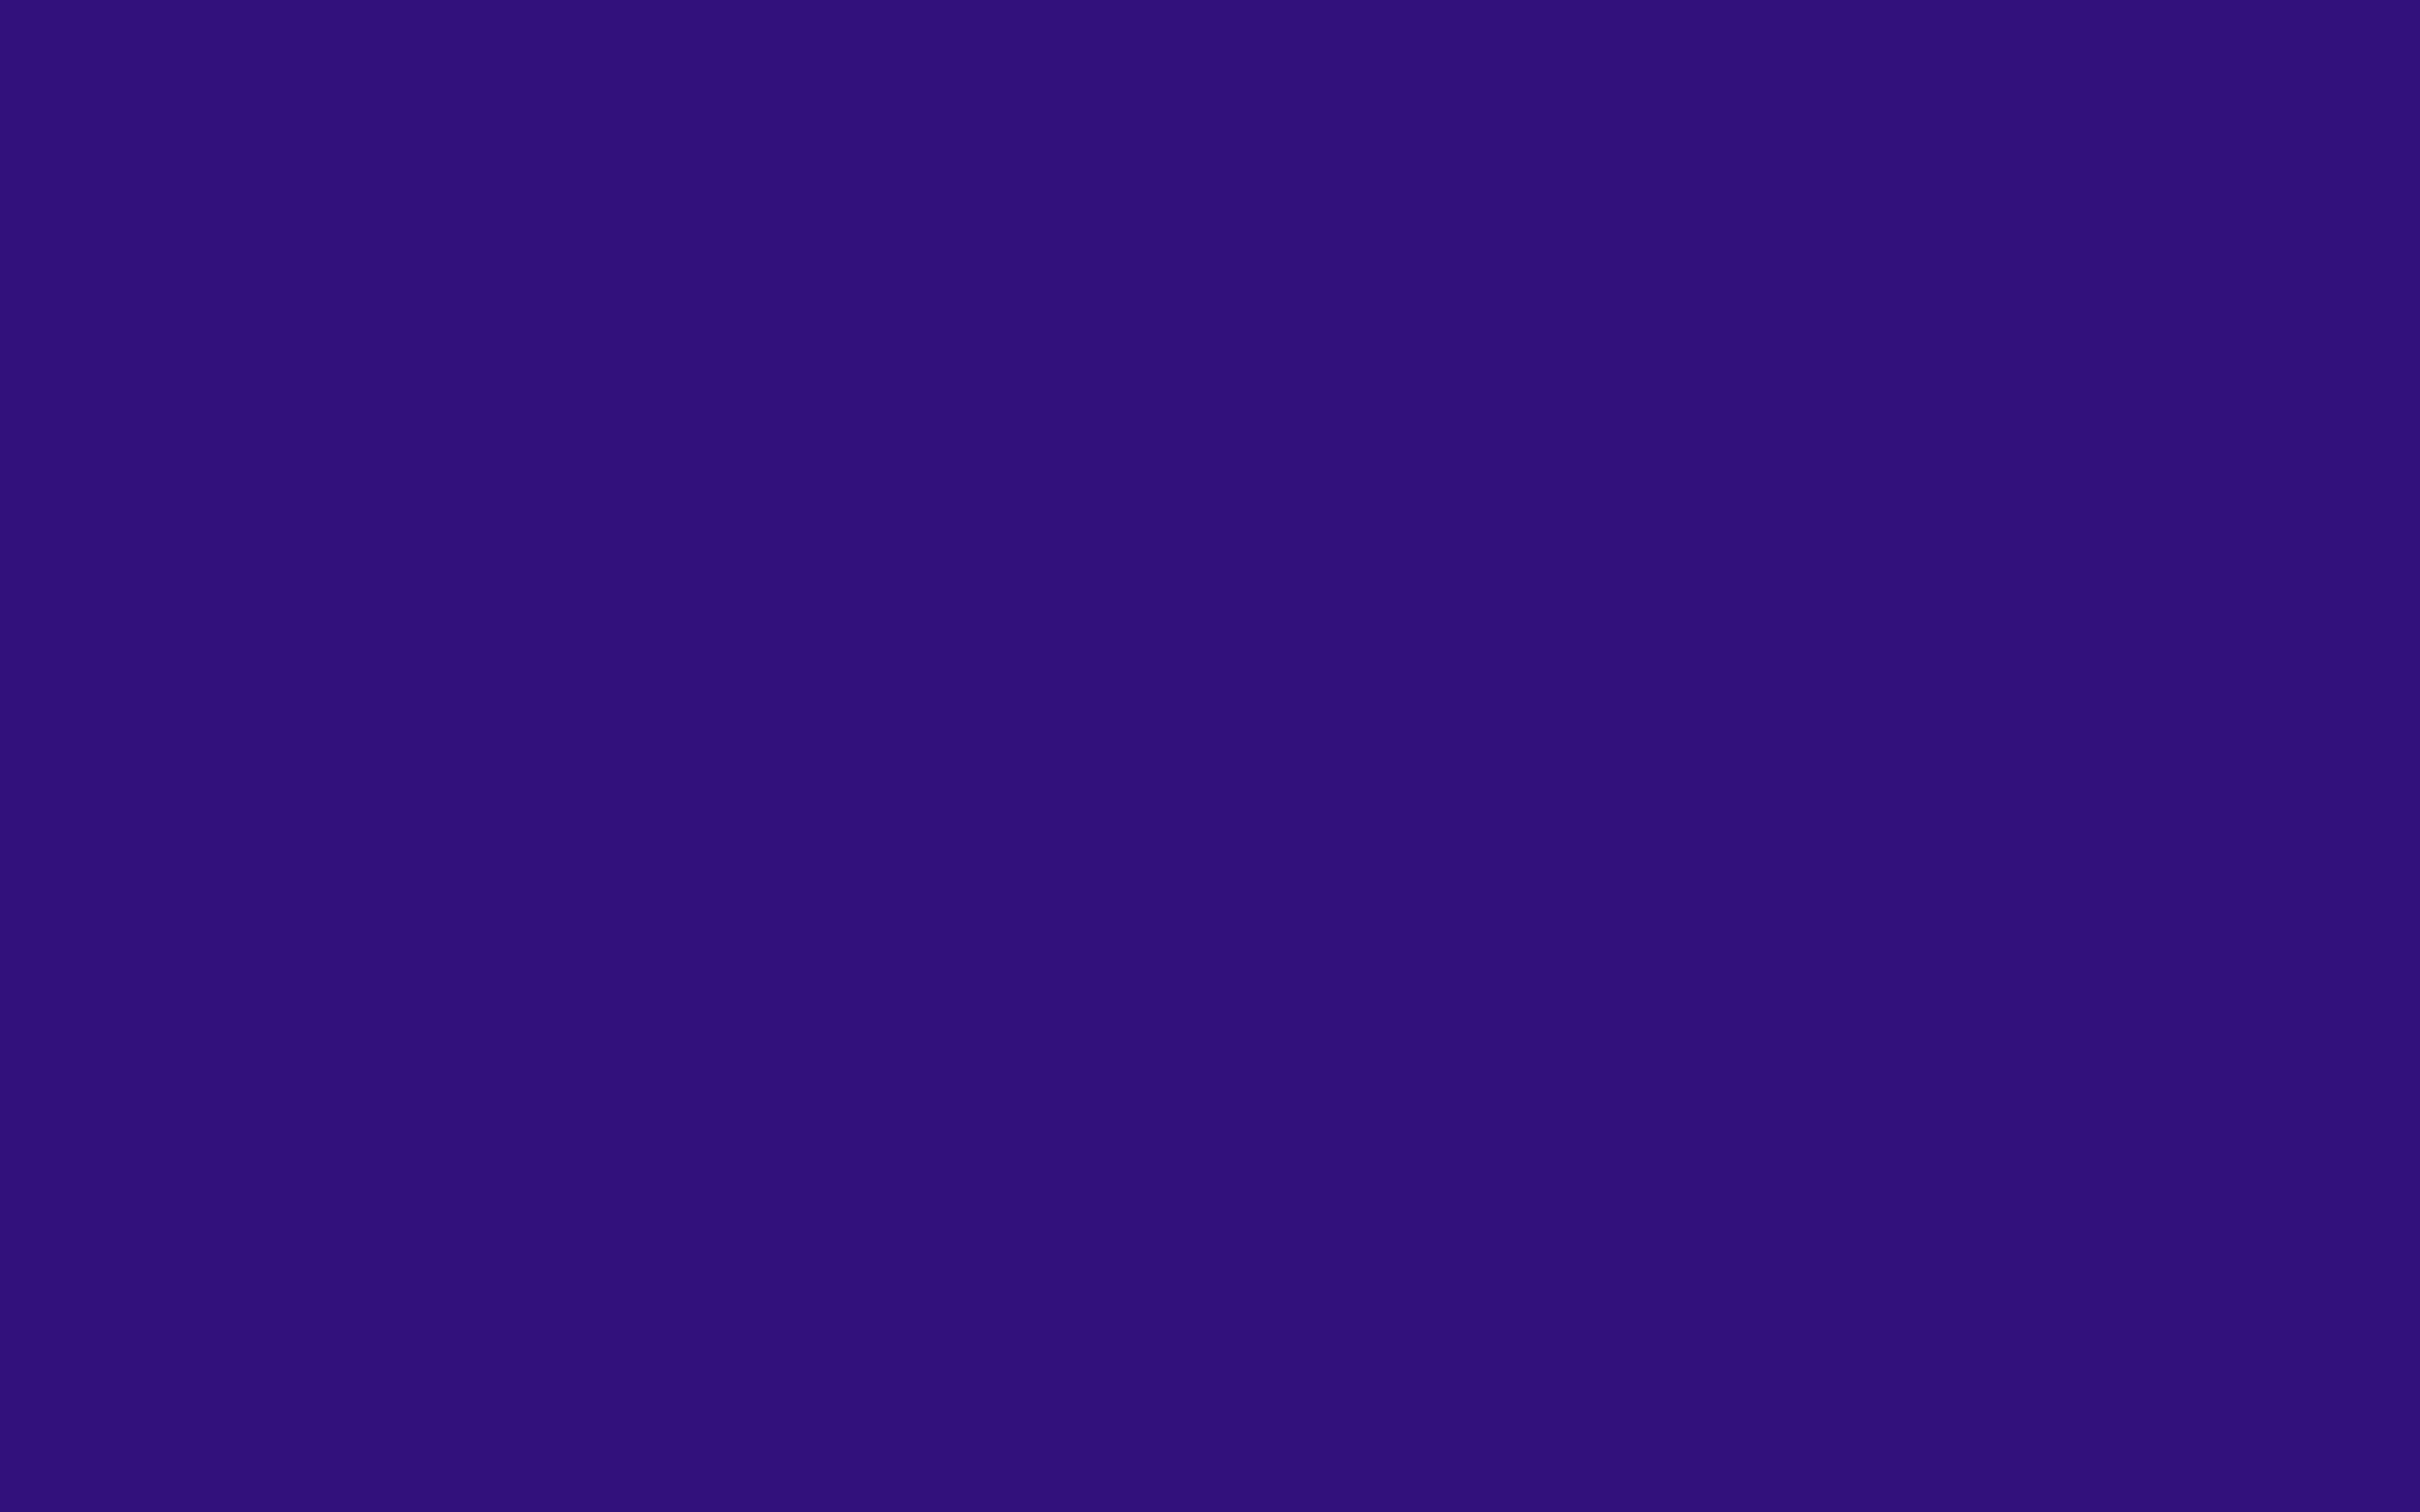 2560x1600 Persian Indigo Solid Color Background